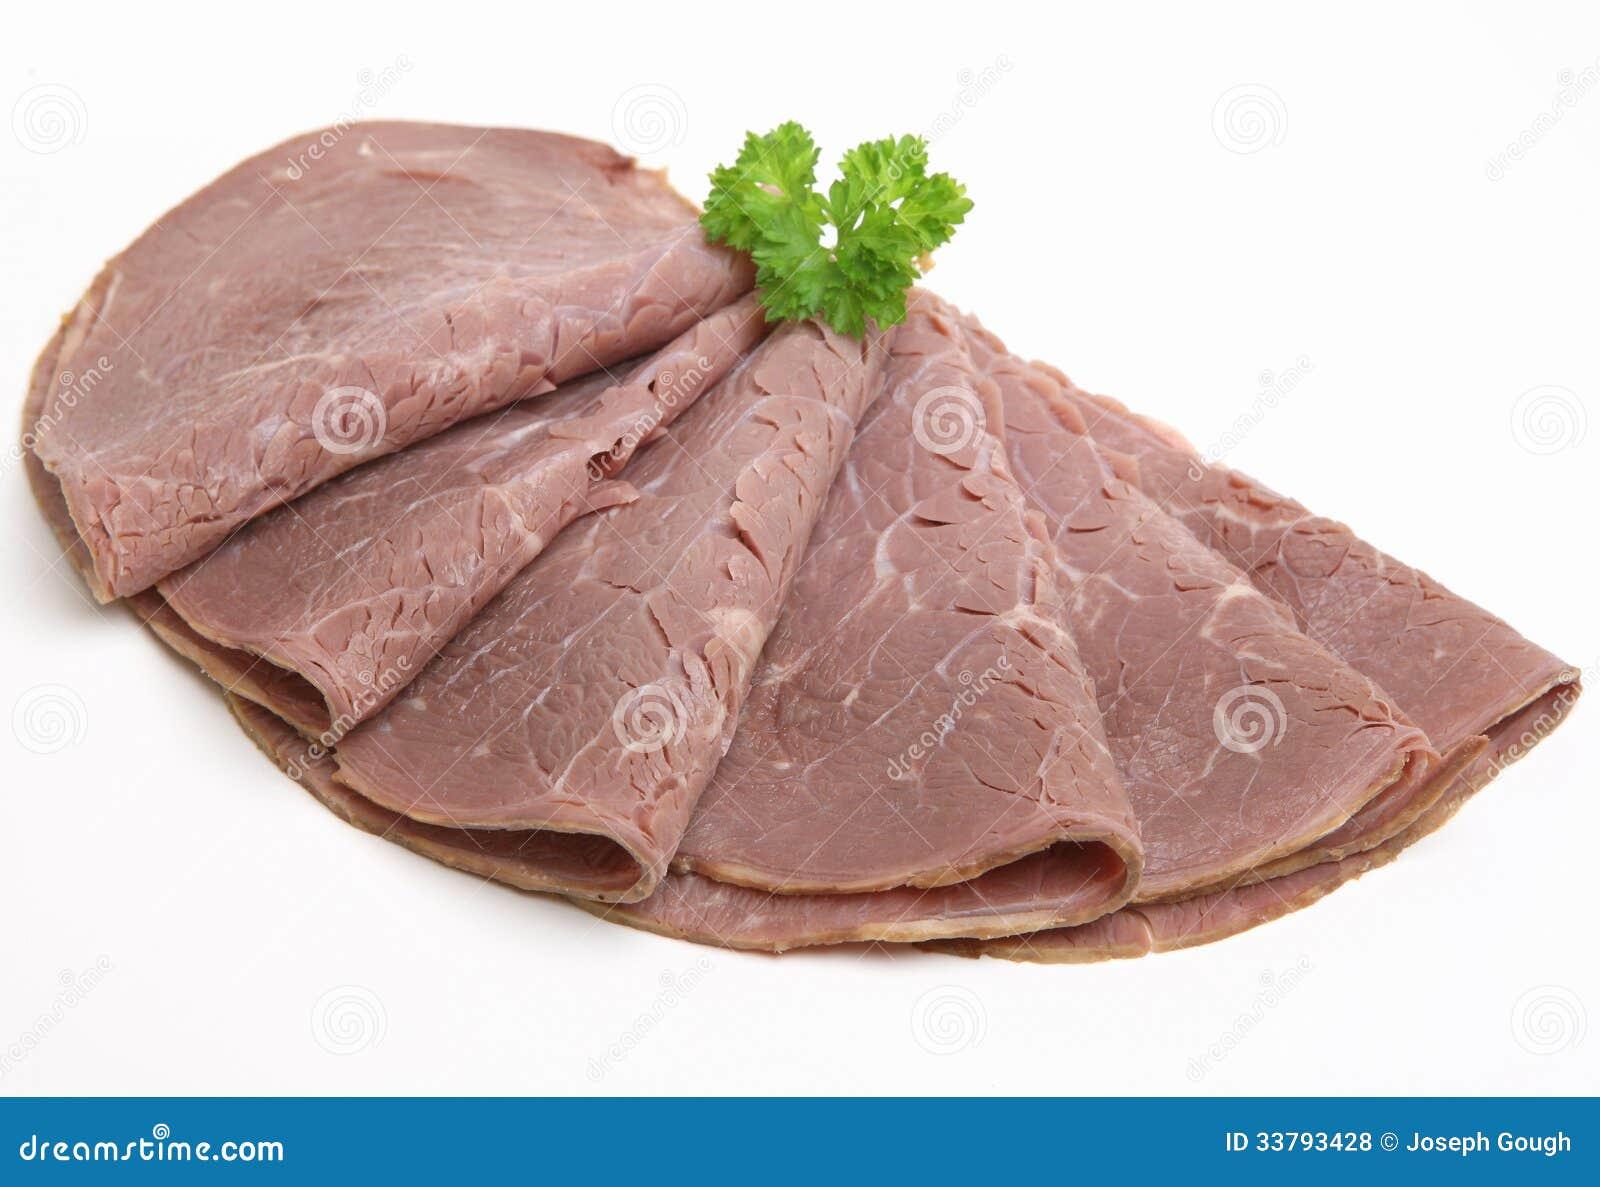 Sliced roast beef package - Arranged Beef Cold Fan Isolated Meat Roast Sliced